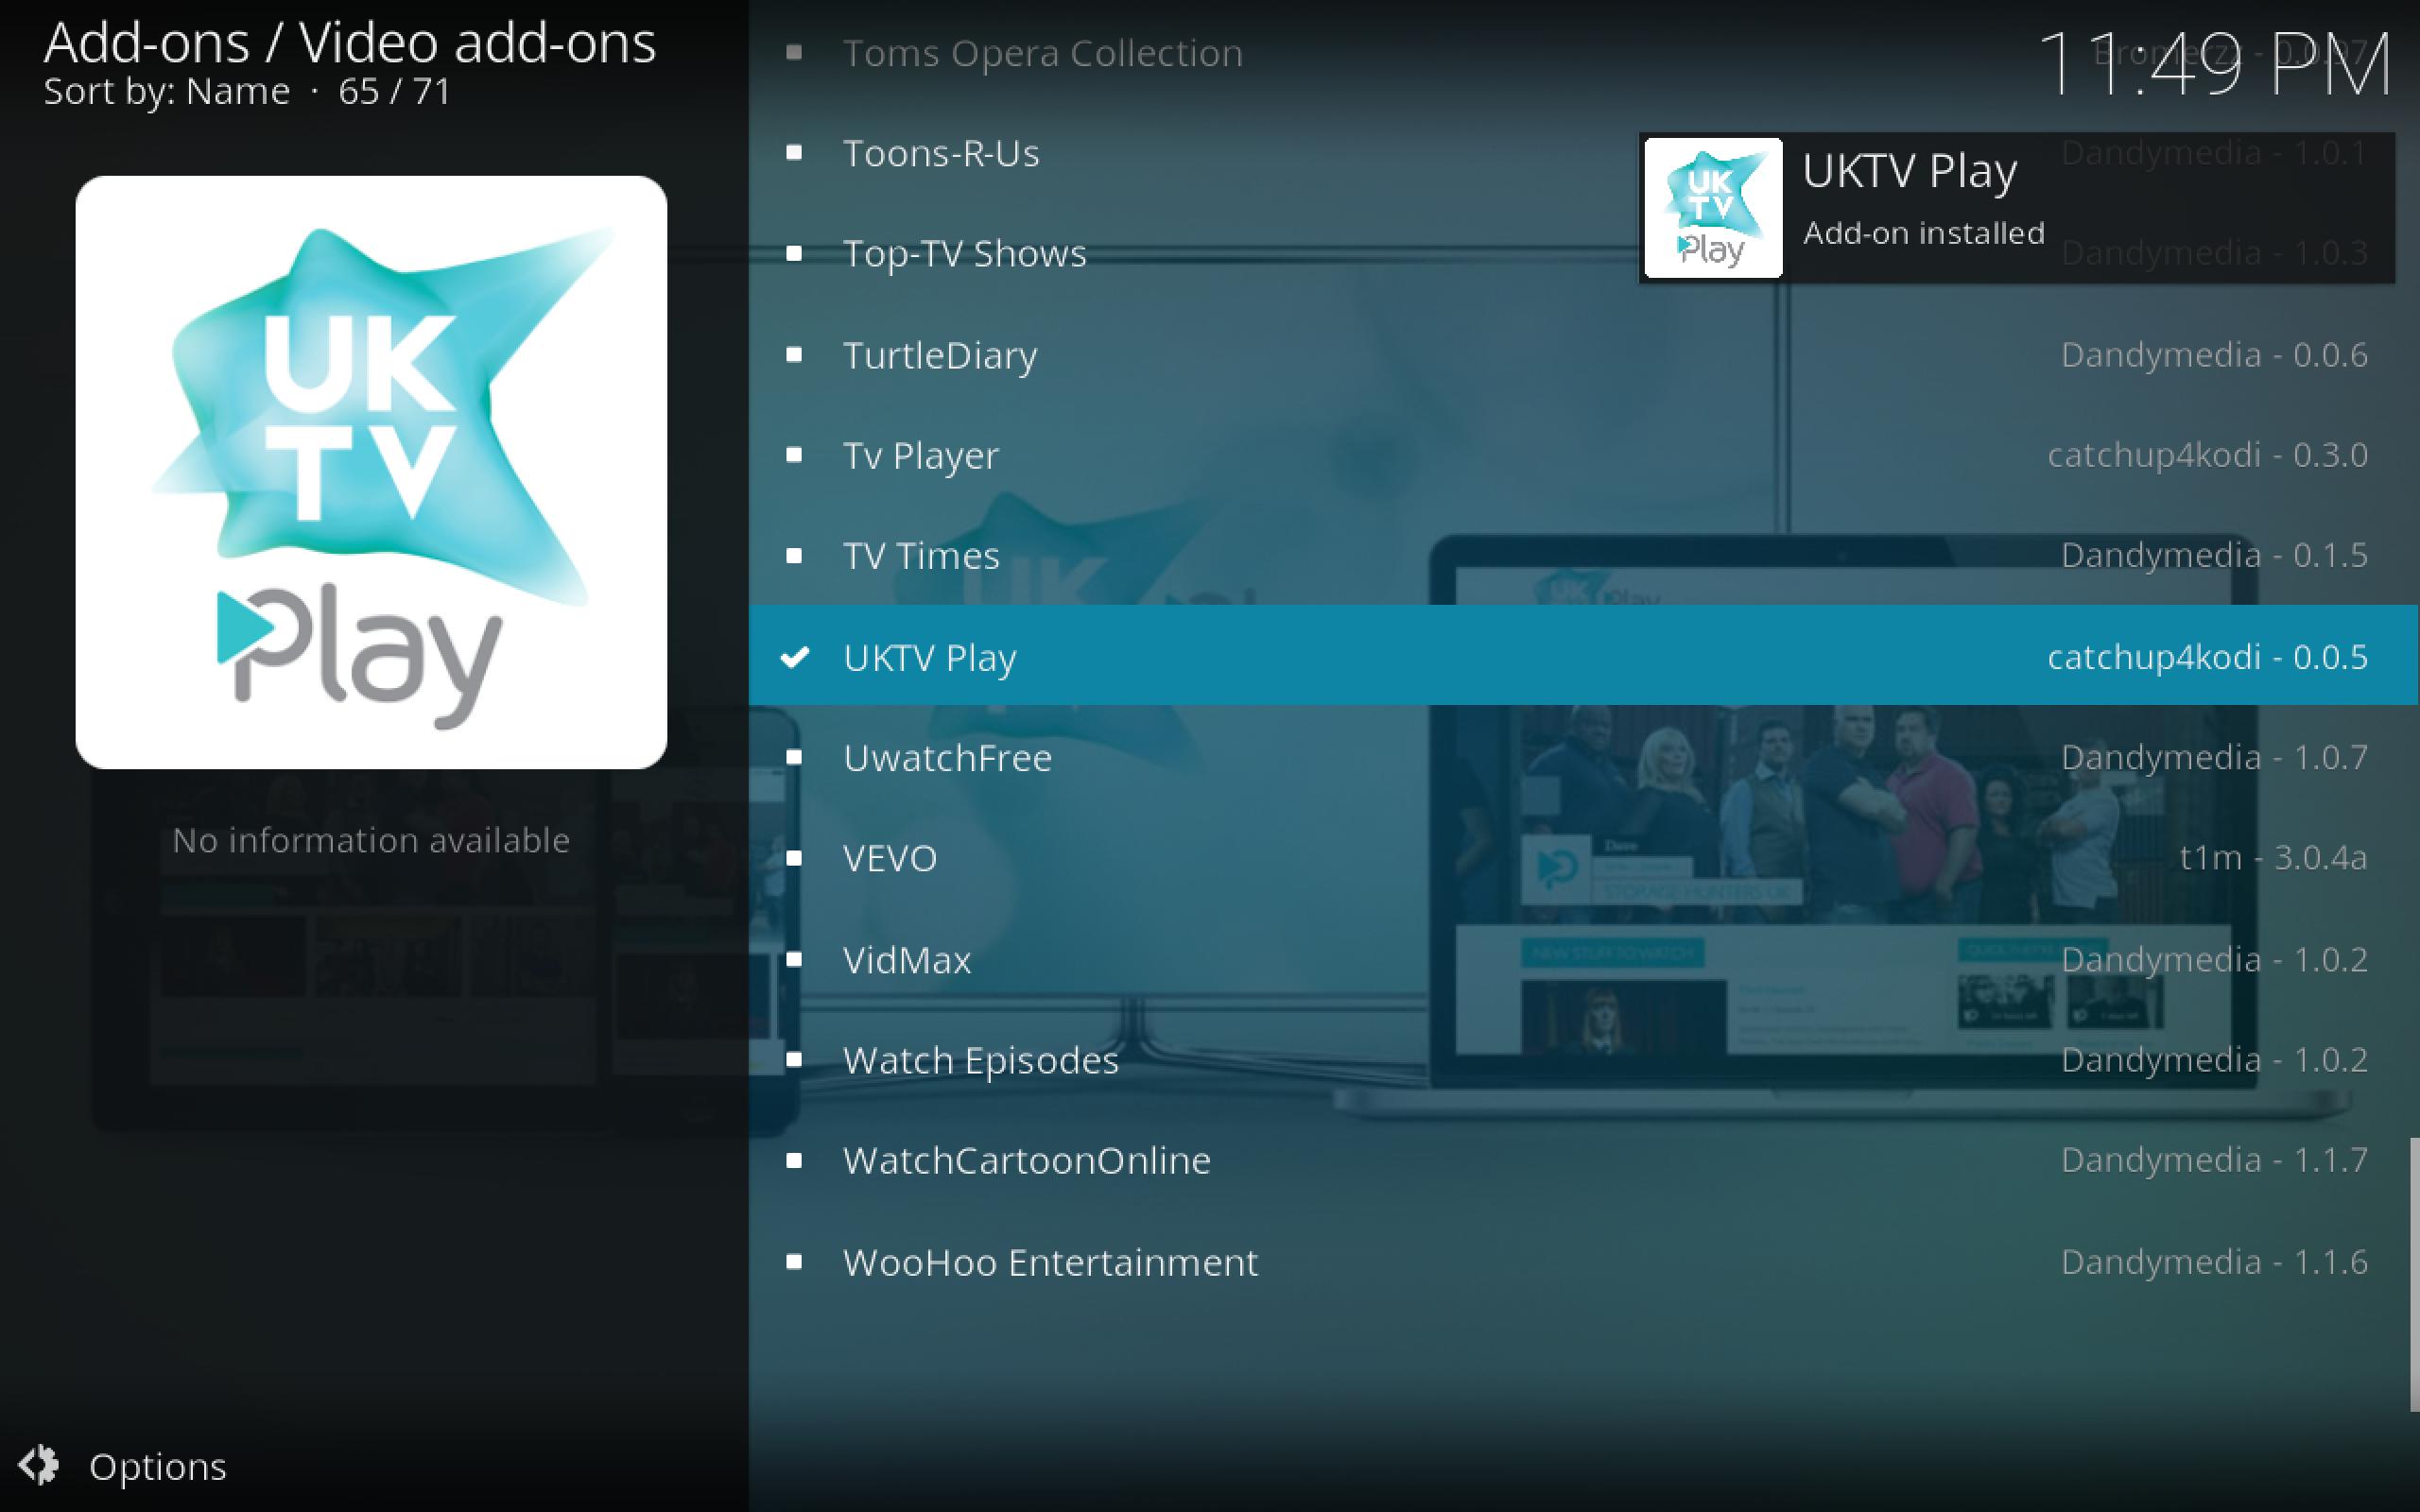 UKTV Play Installed